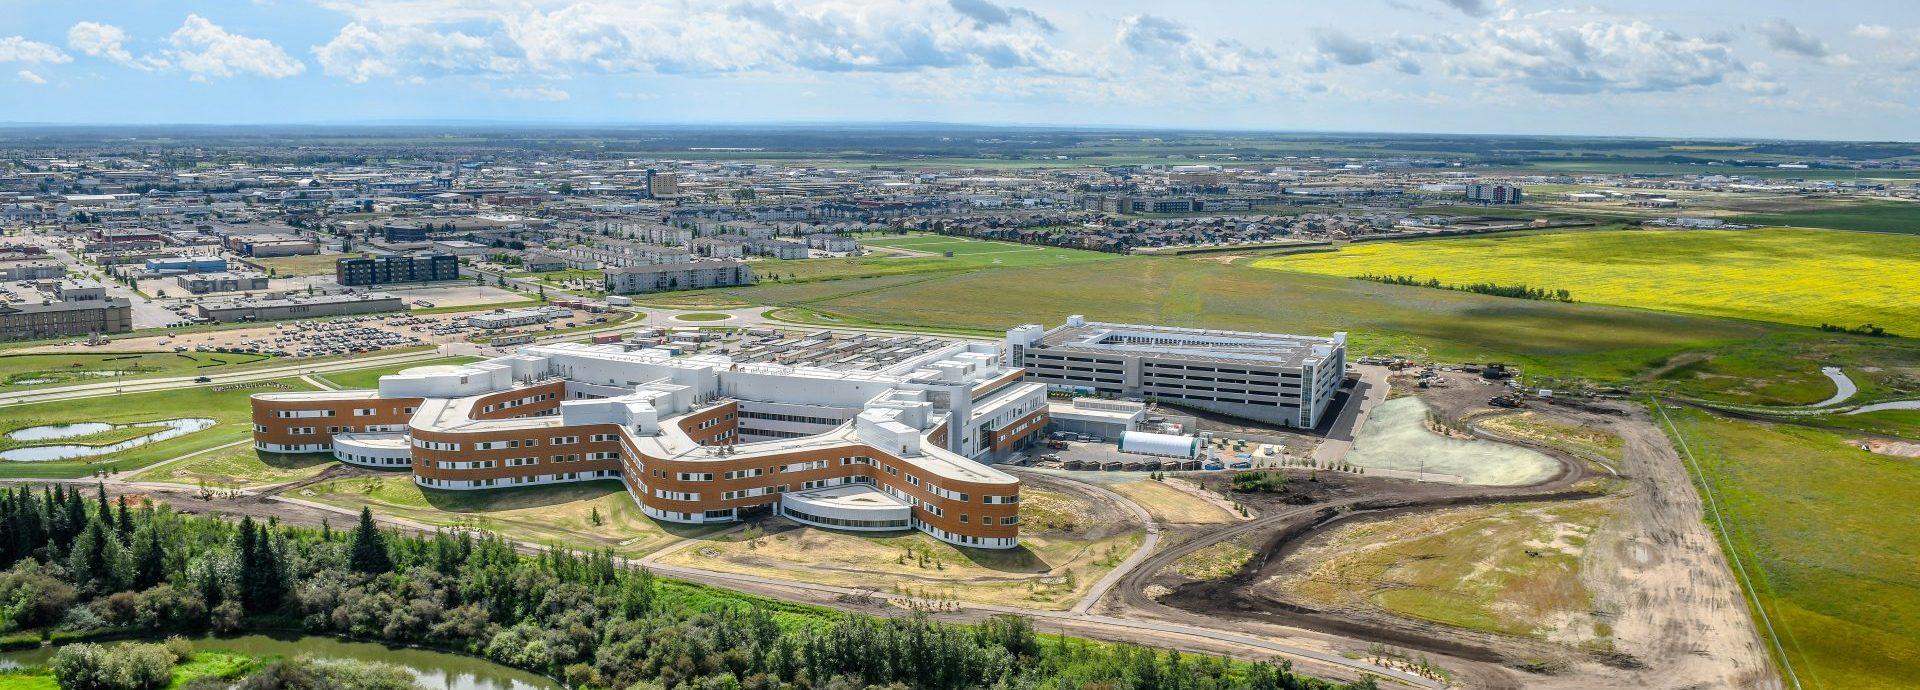 New Hospital